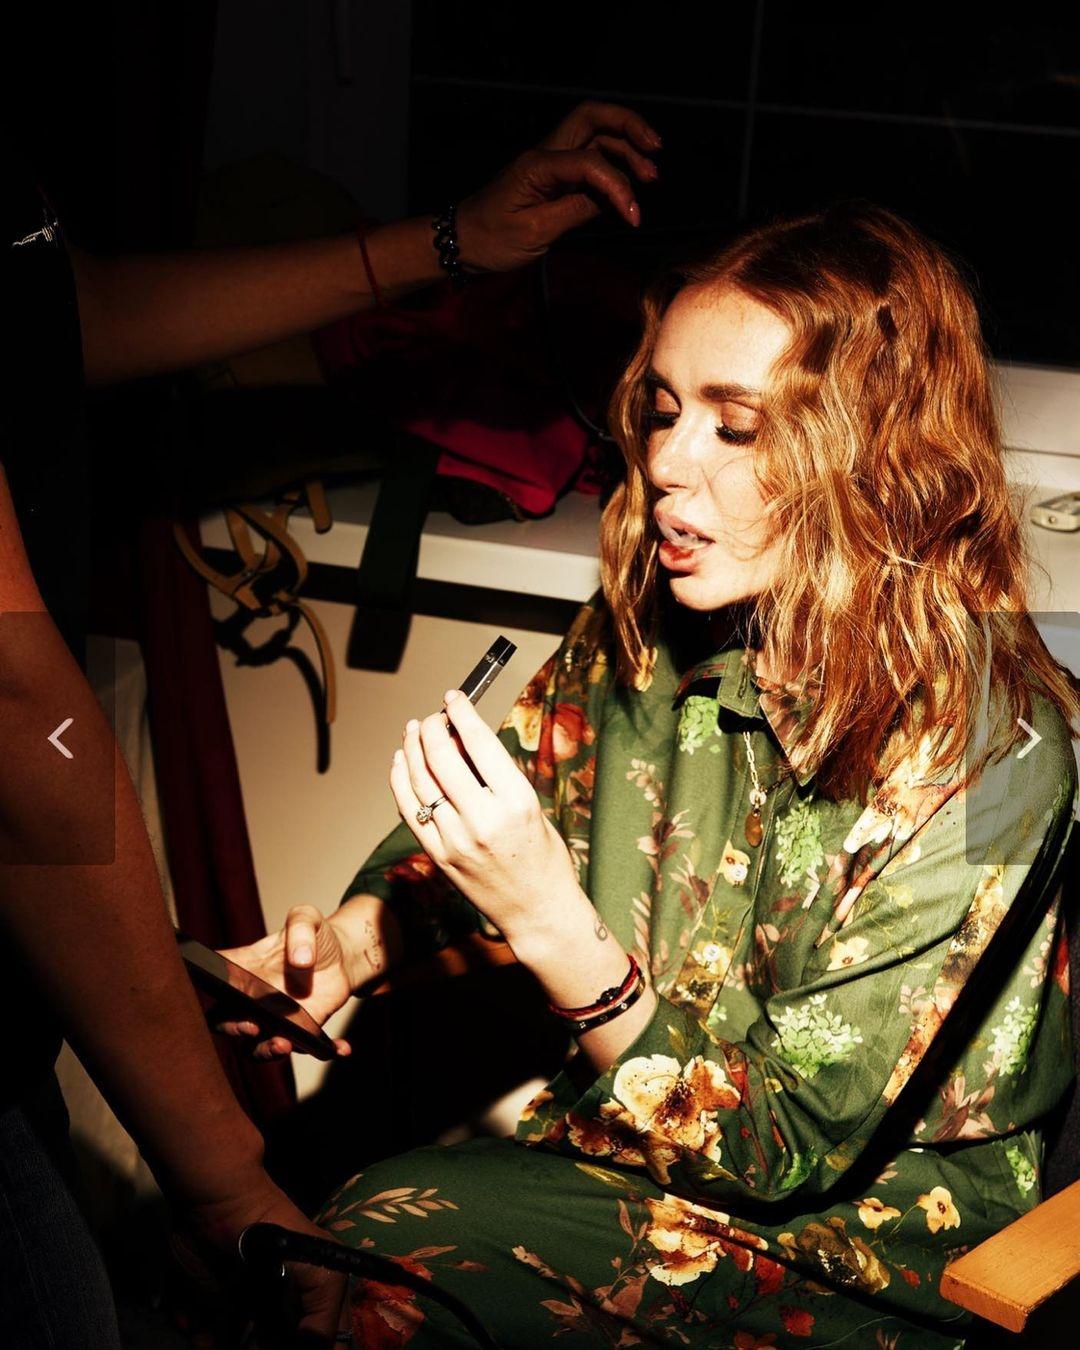 Слава Каминская призналась, что употребляла наркотики - фото №2